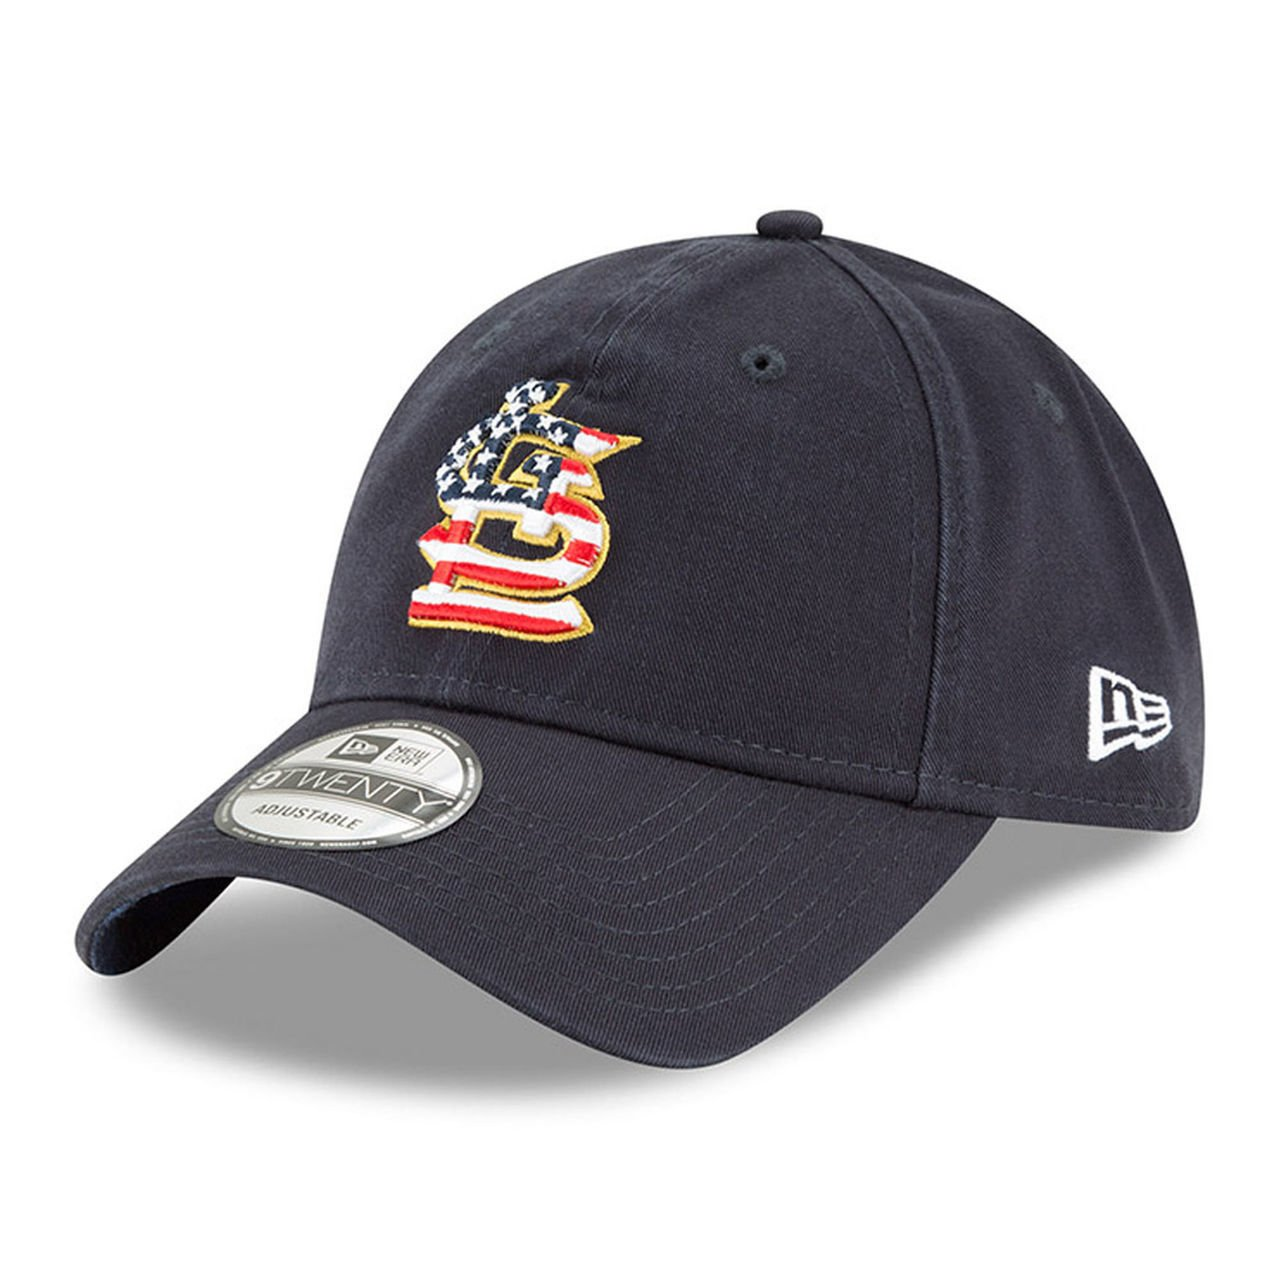 e266f8d6 New Era St. Louis Cardinals 2018 July 4th Stars and Stripes 9TWENTY  Adjustable Hat